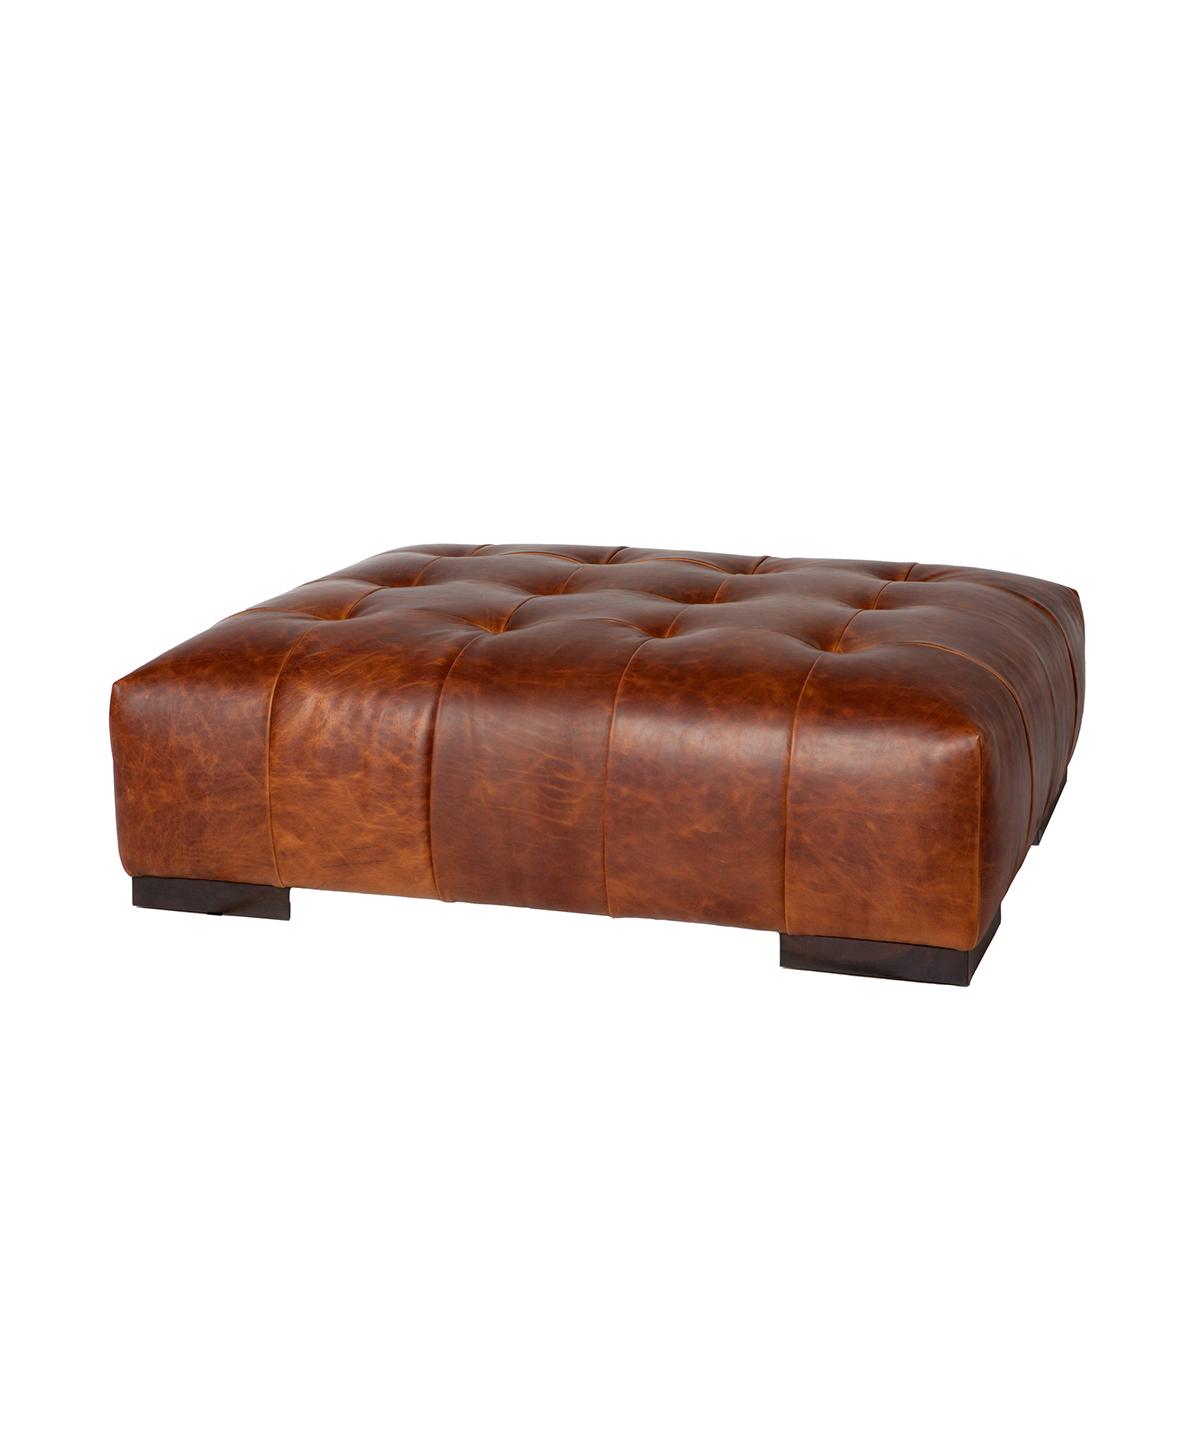 Arden Leather Ottoman Large